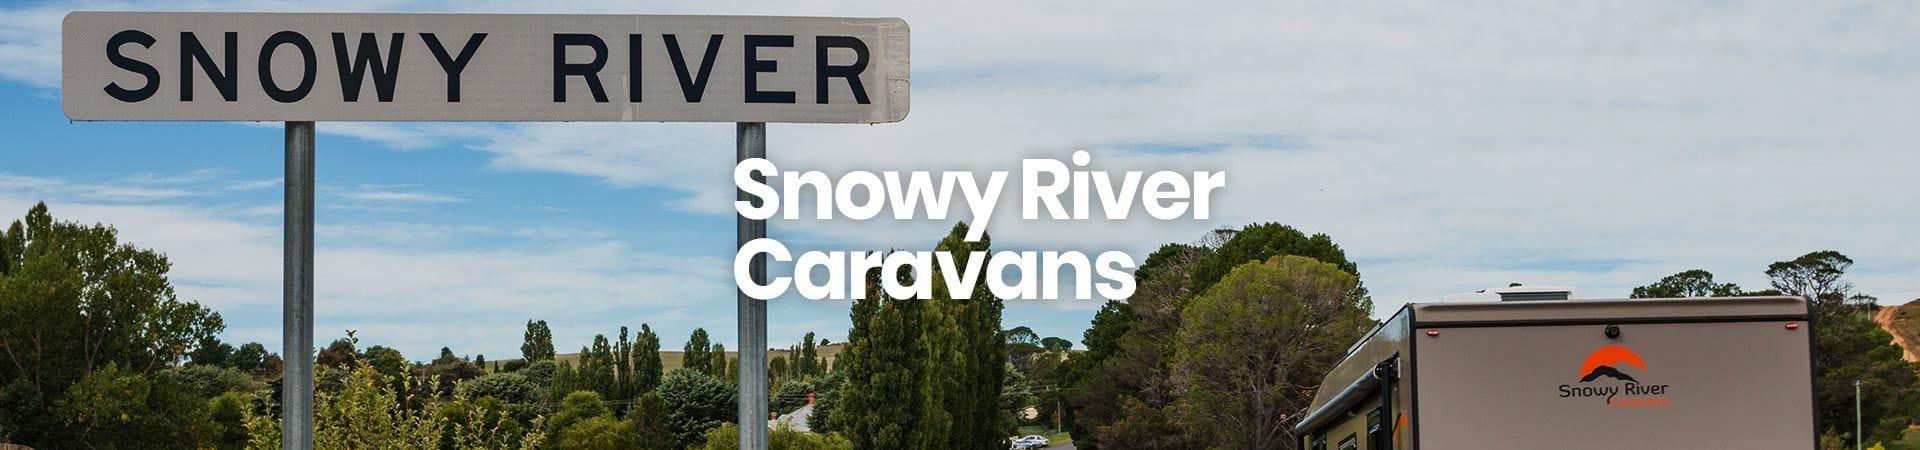 Snowy River Caravans Media